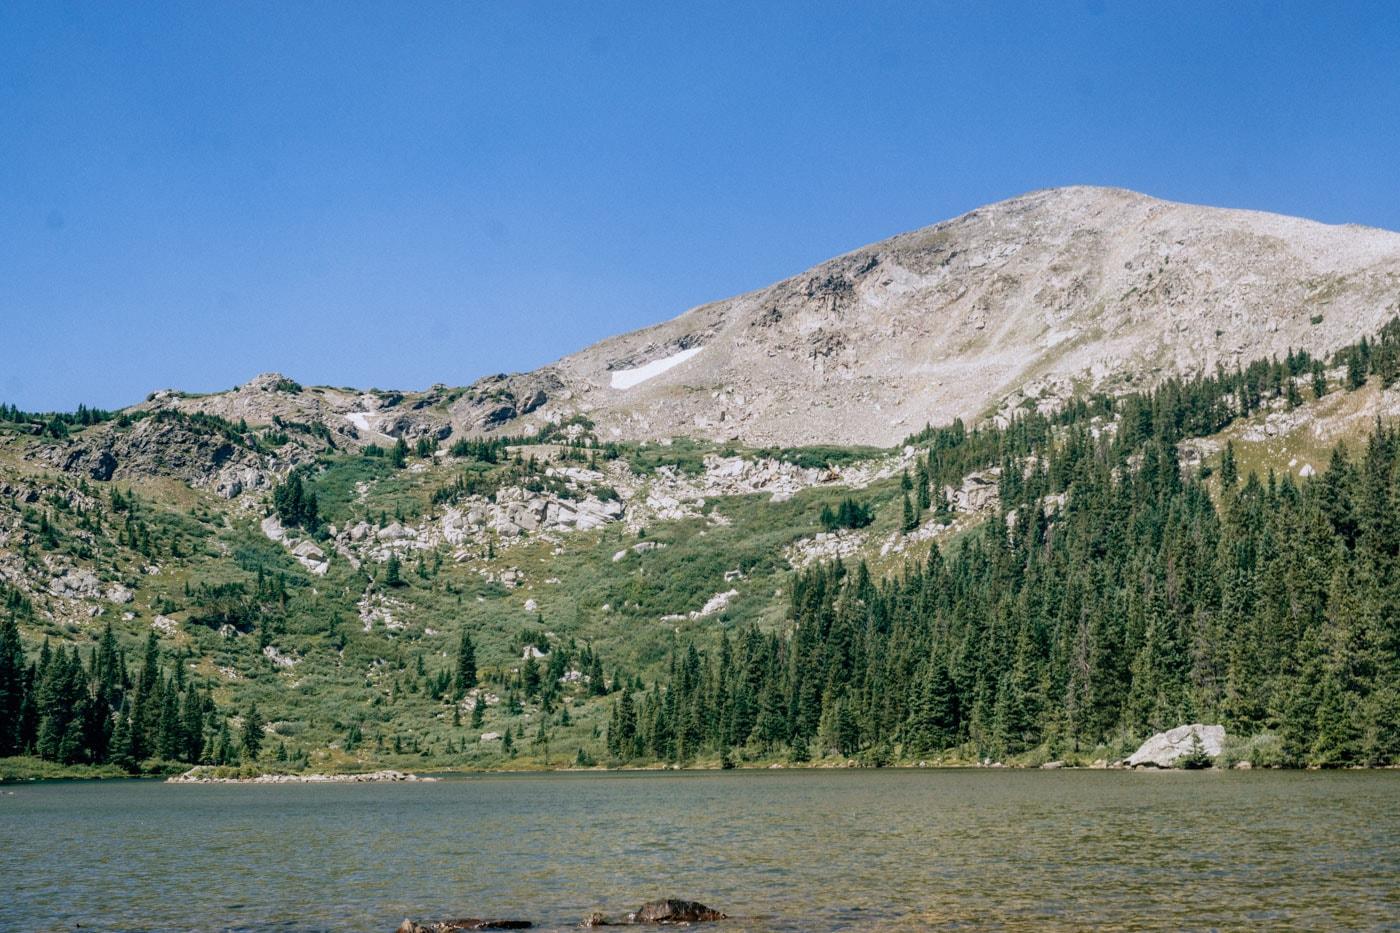 Hike Kroenke Lake outside Buena Vista